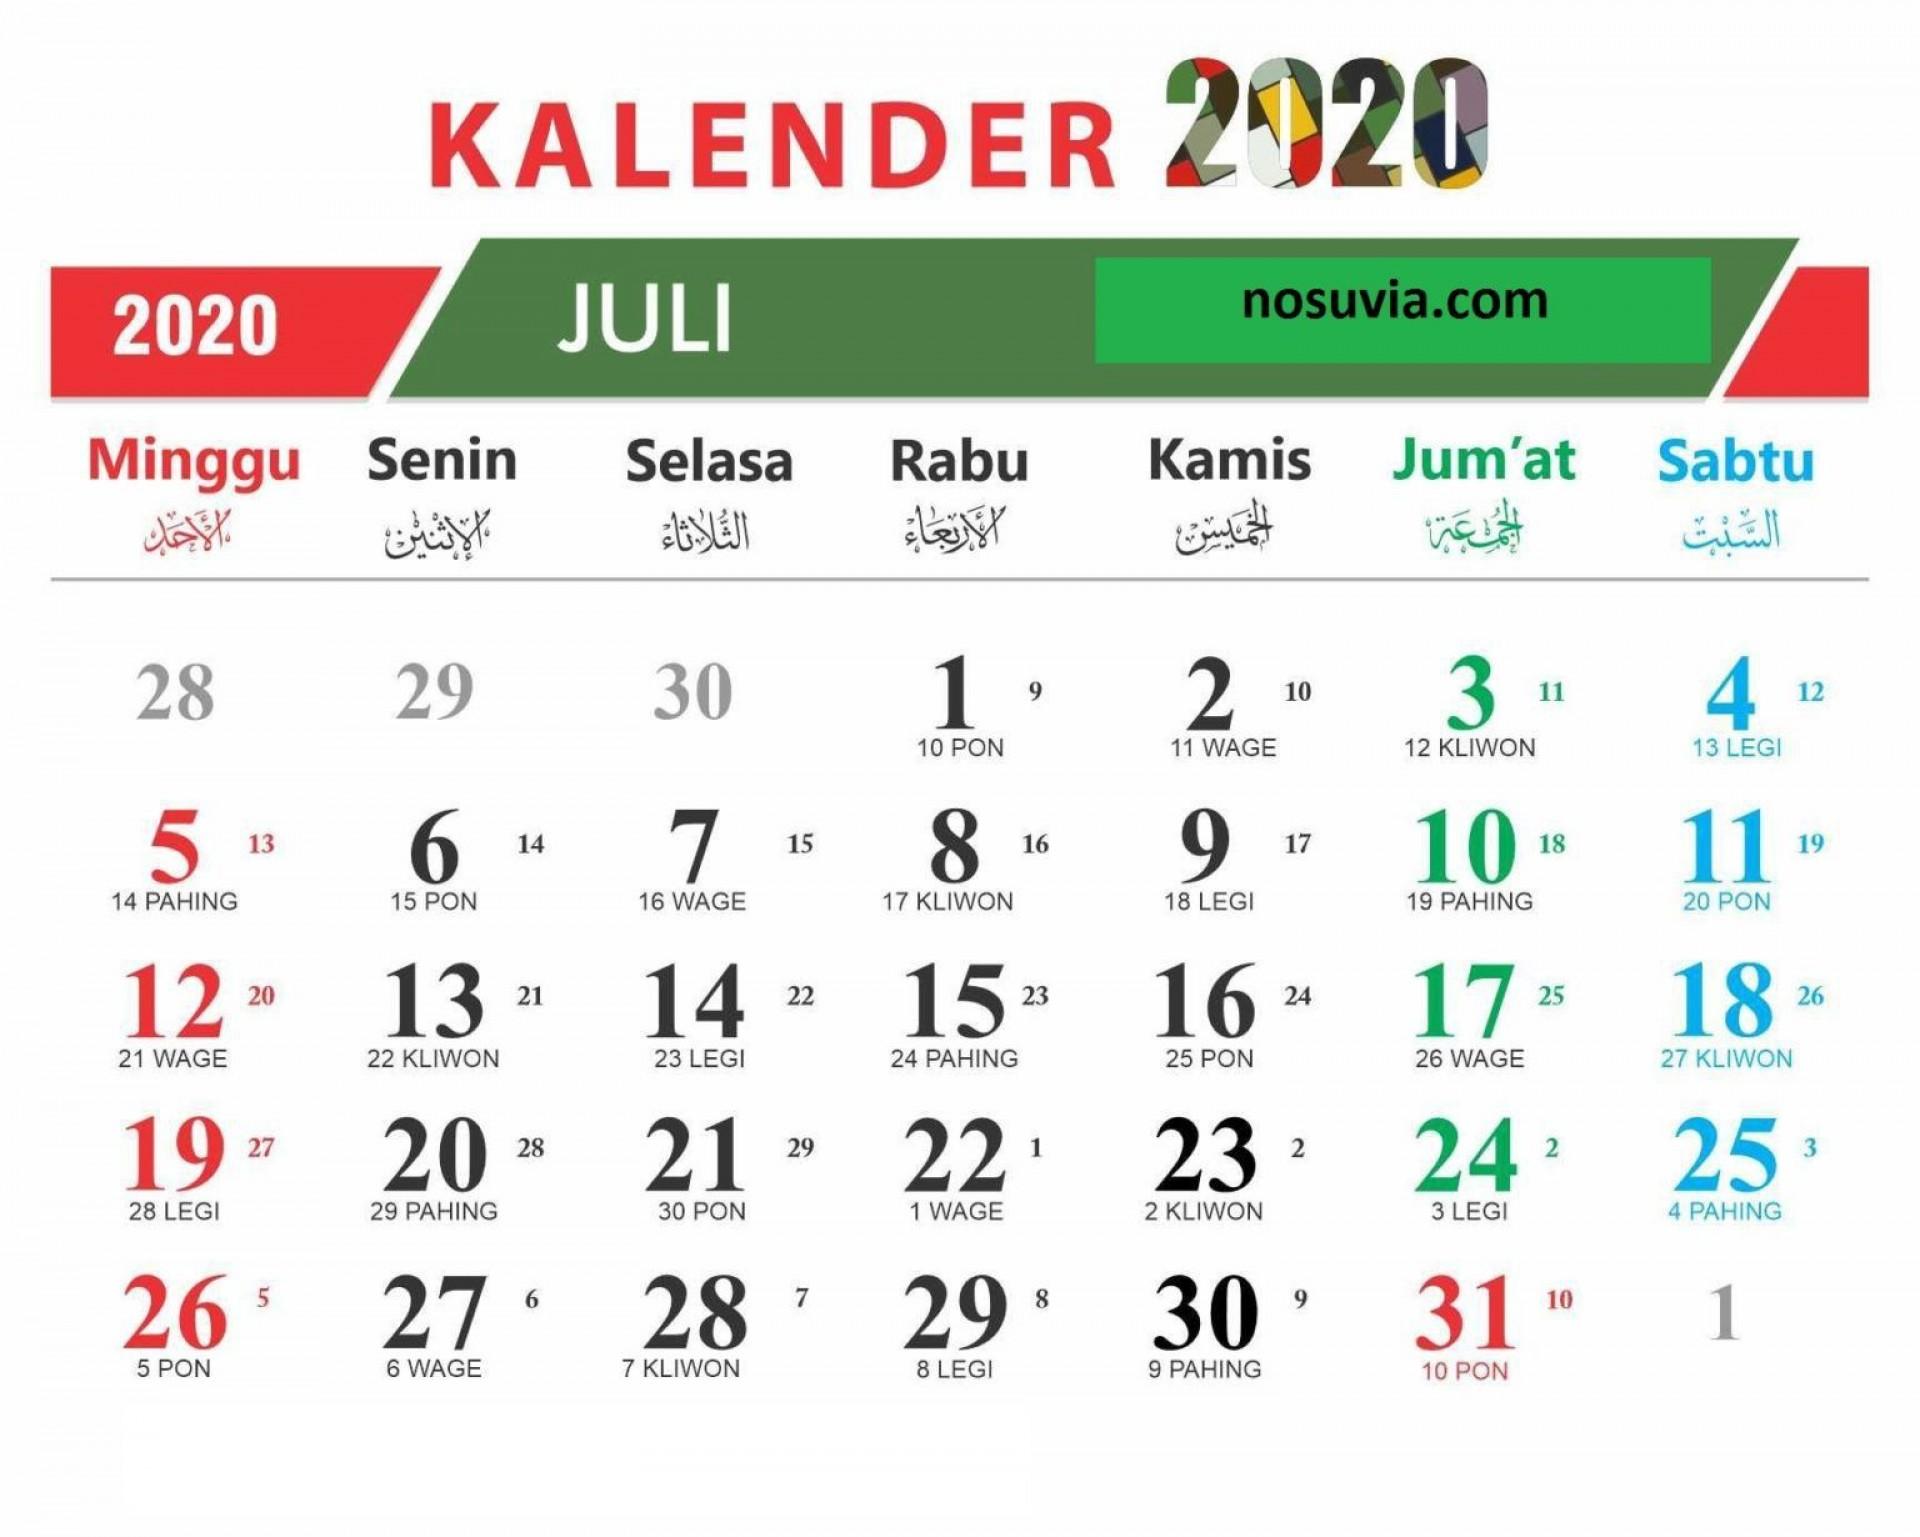 006 Breathtaking 2019 Calendar Template Word 2007 Inspiration 1920